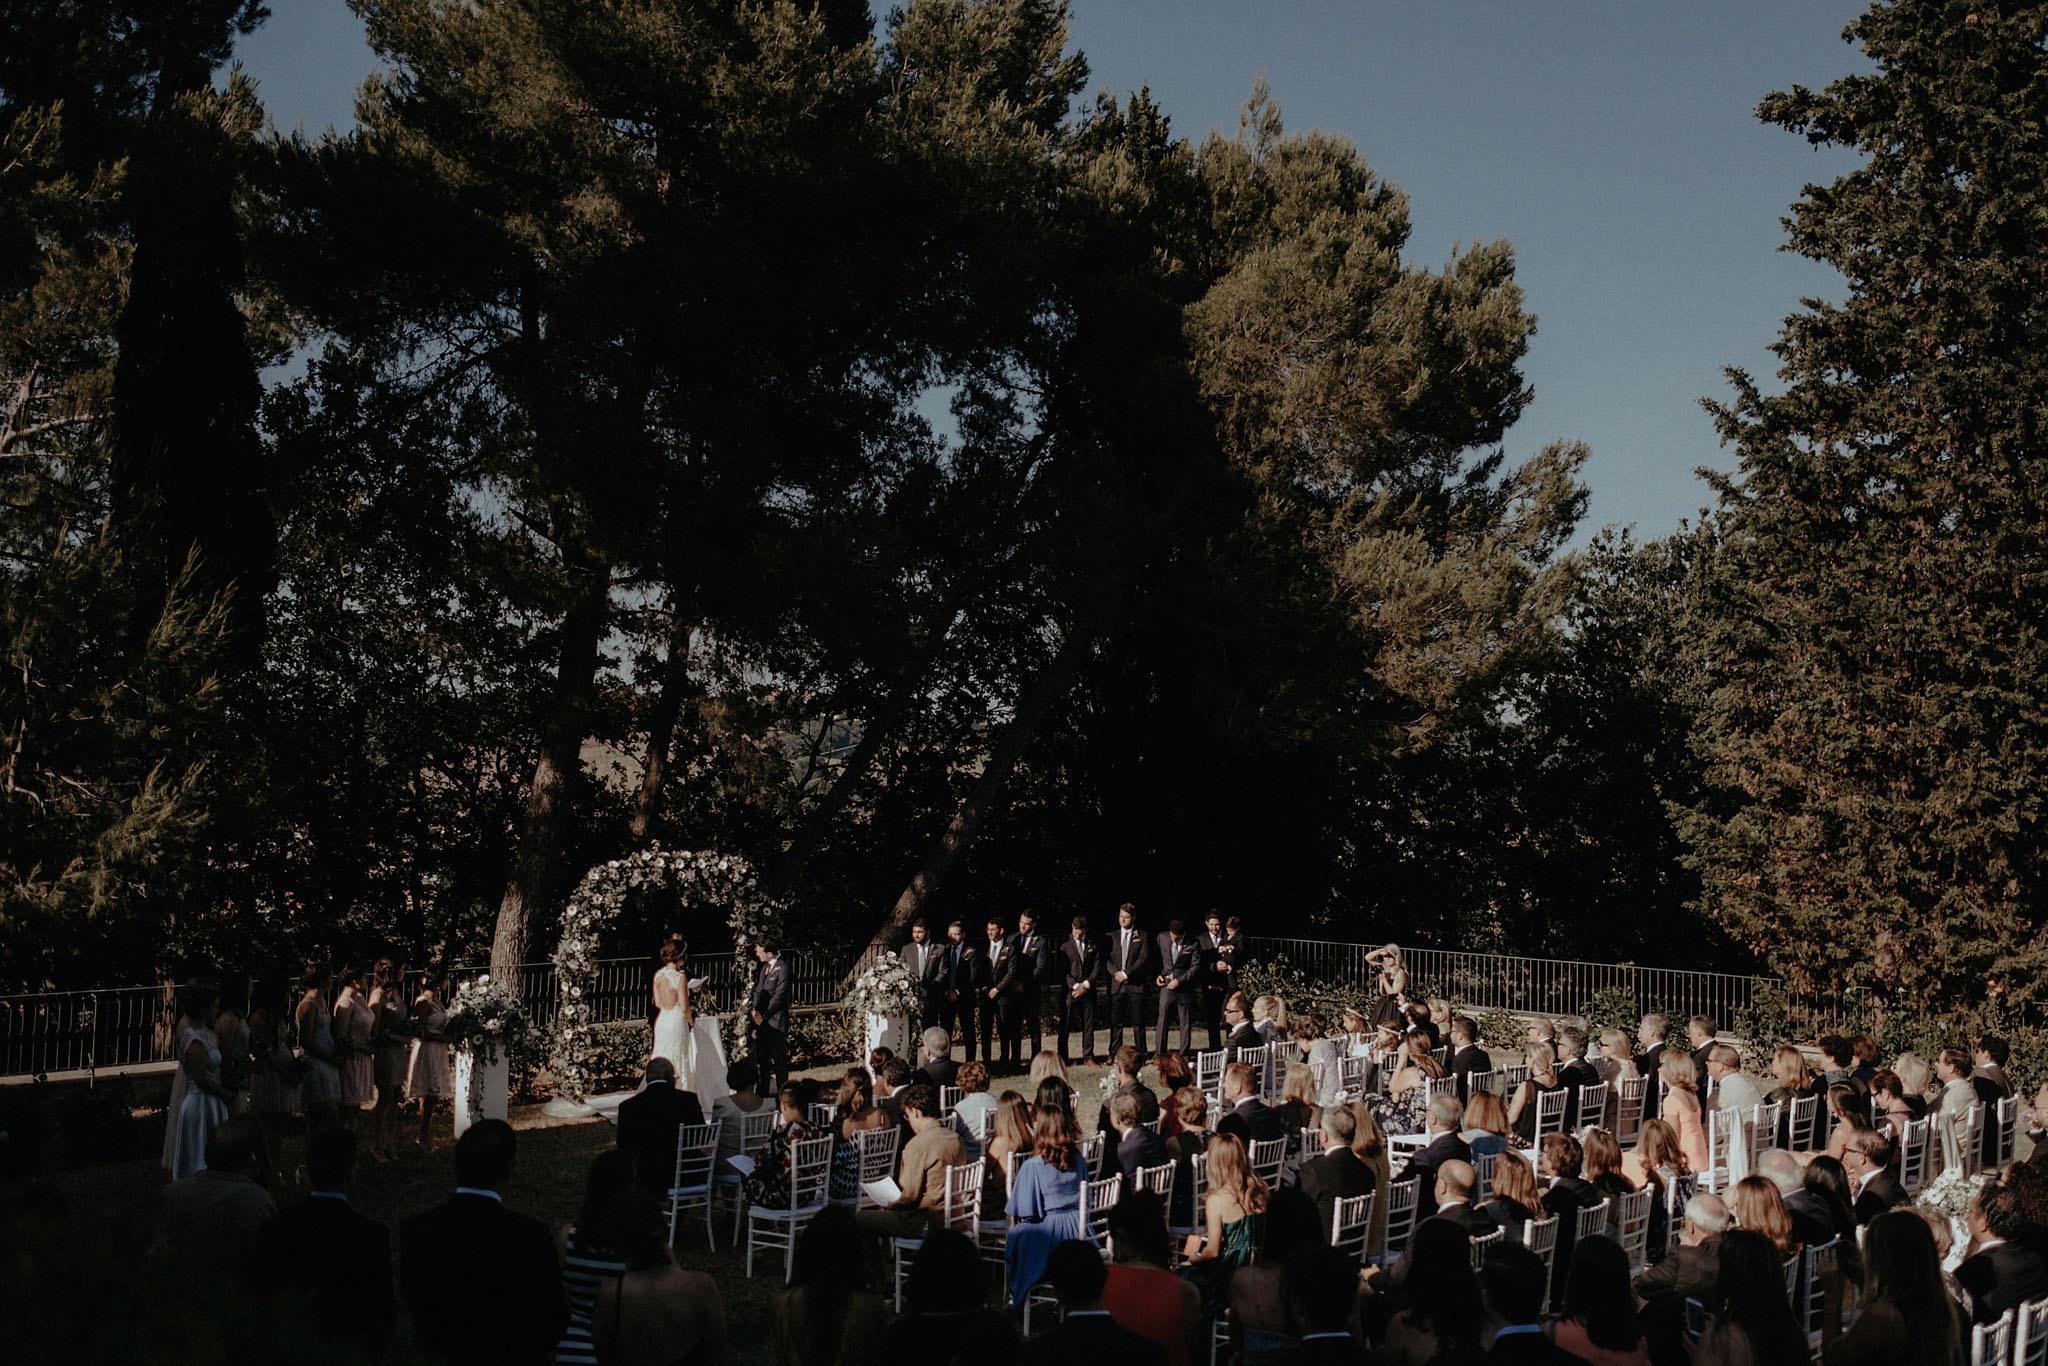 Max-Steph-Italy-Wedding-366.jpg